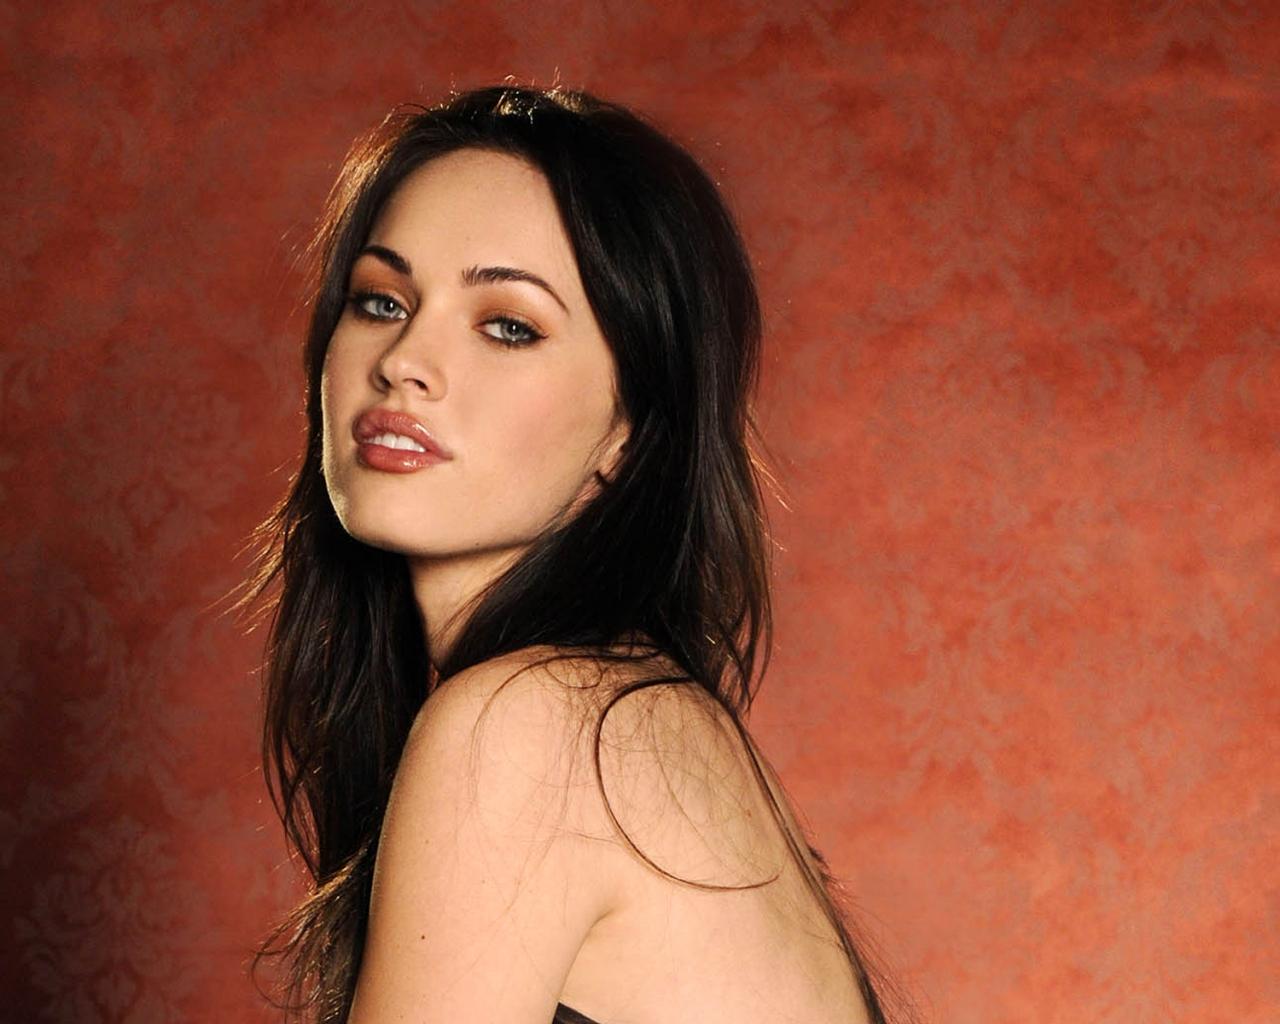 Linda Megan Fox hd 1280x1024   imagenes   wallpapers gratis   Modelos 1280x1024